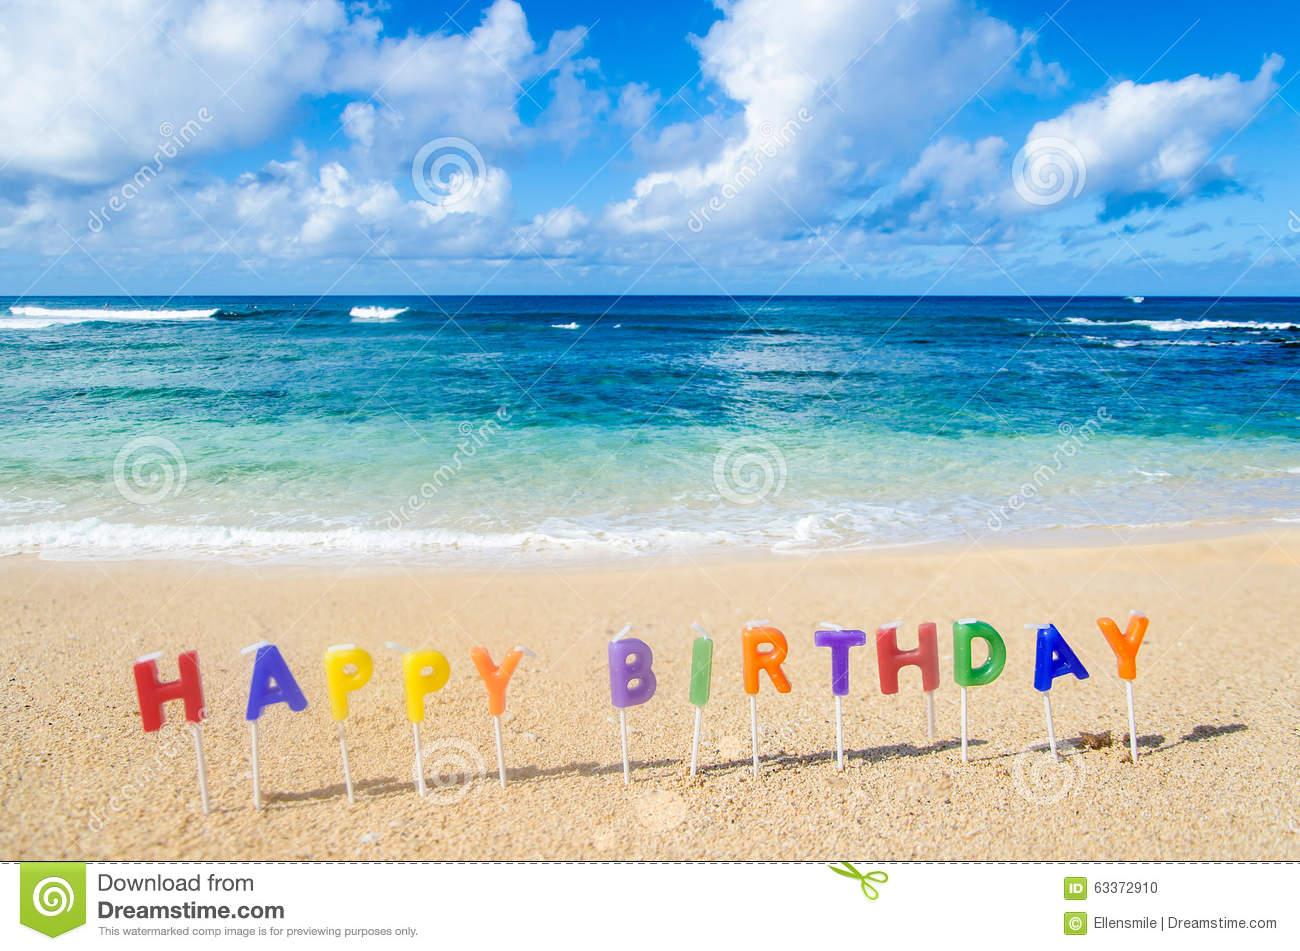 Happy birthday beach clipart 3 » Clipart Station.